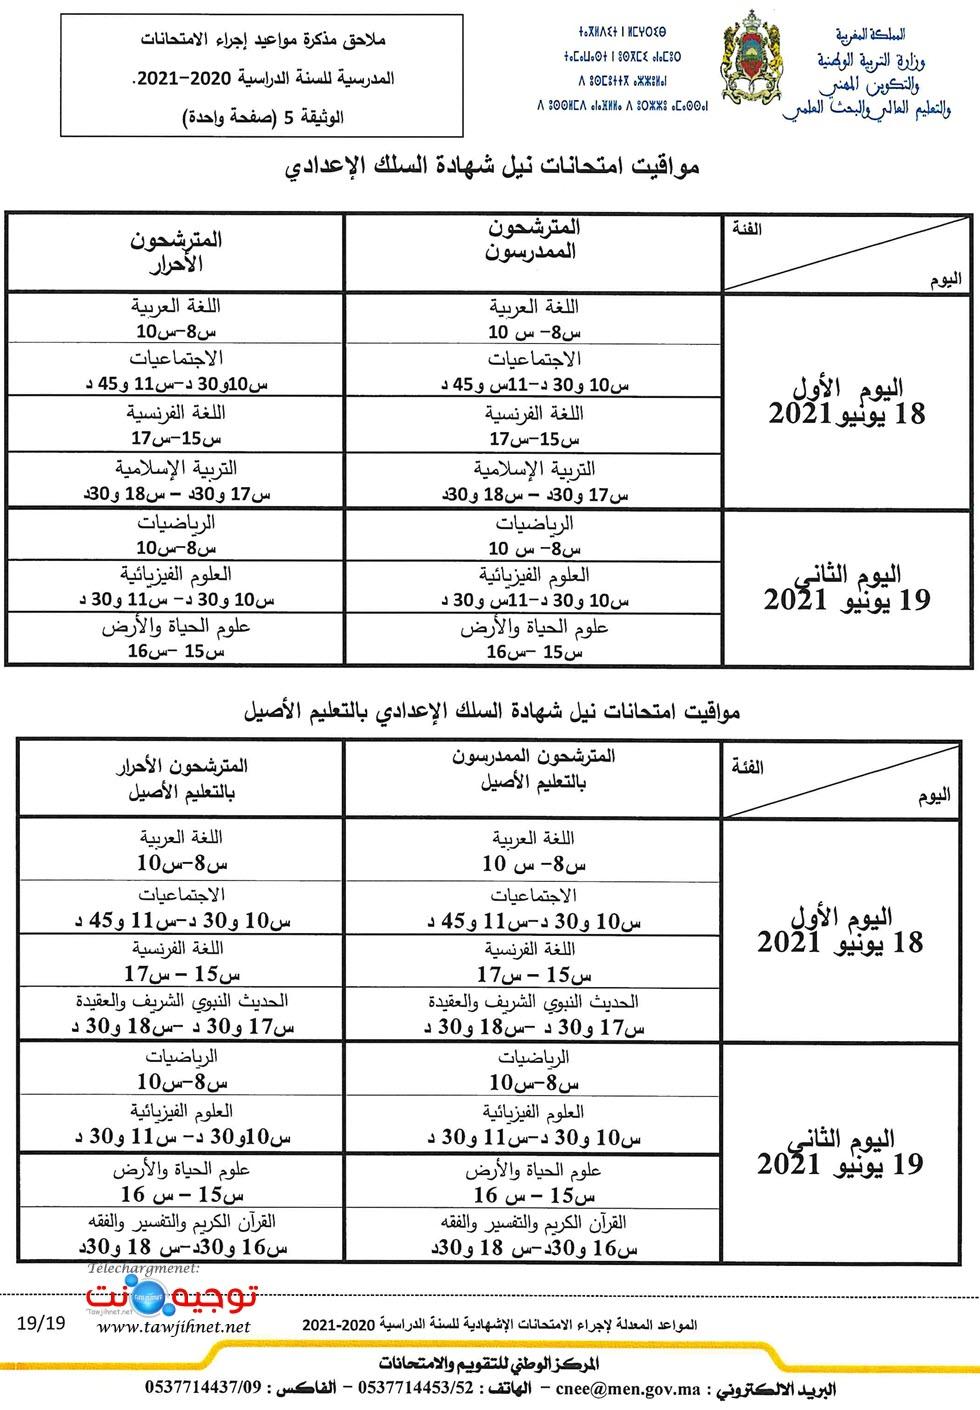 examen-2021-national-regional-provincial_Page_19.jpg